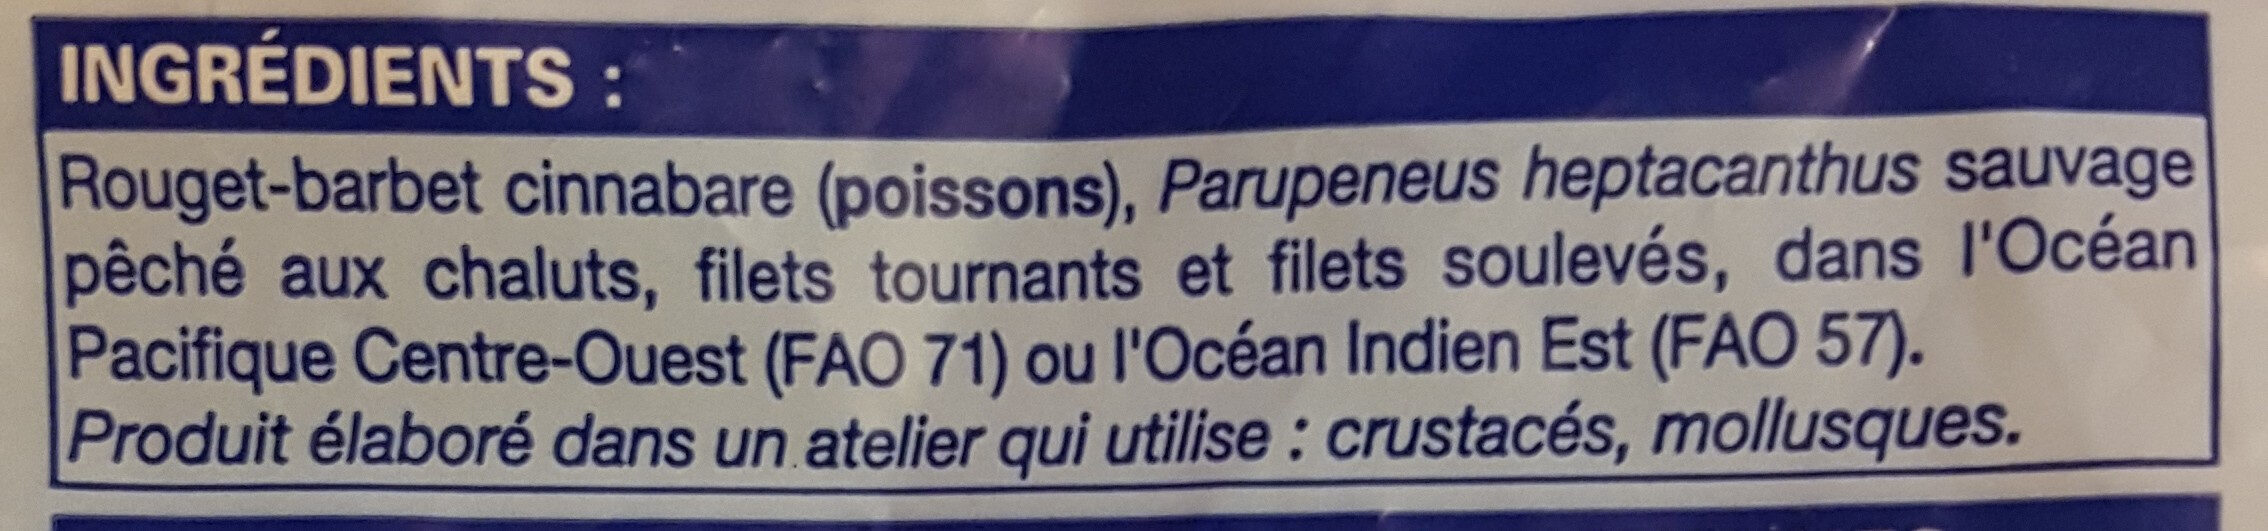 Filets de rouget-barbet Cinnabare - Ingrediënten - fr